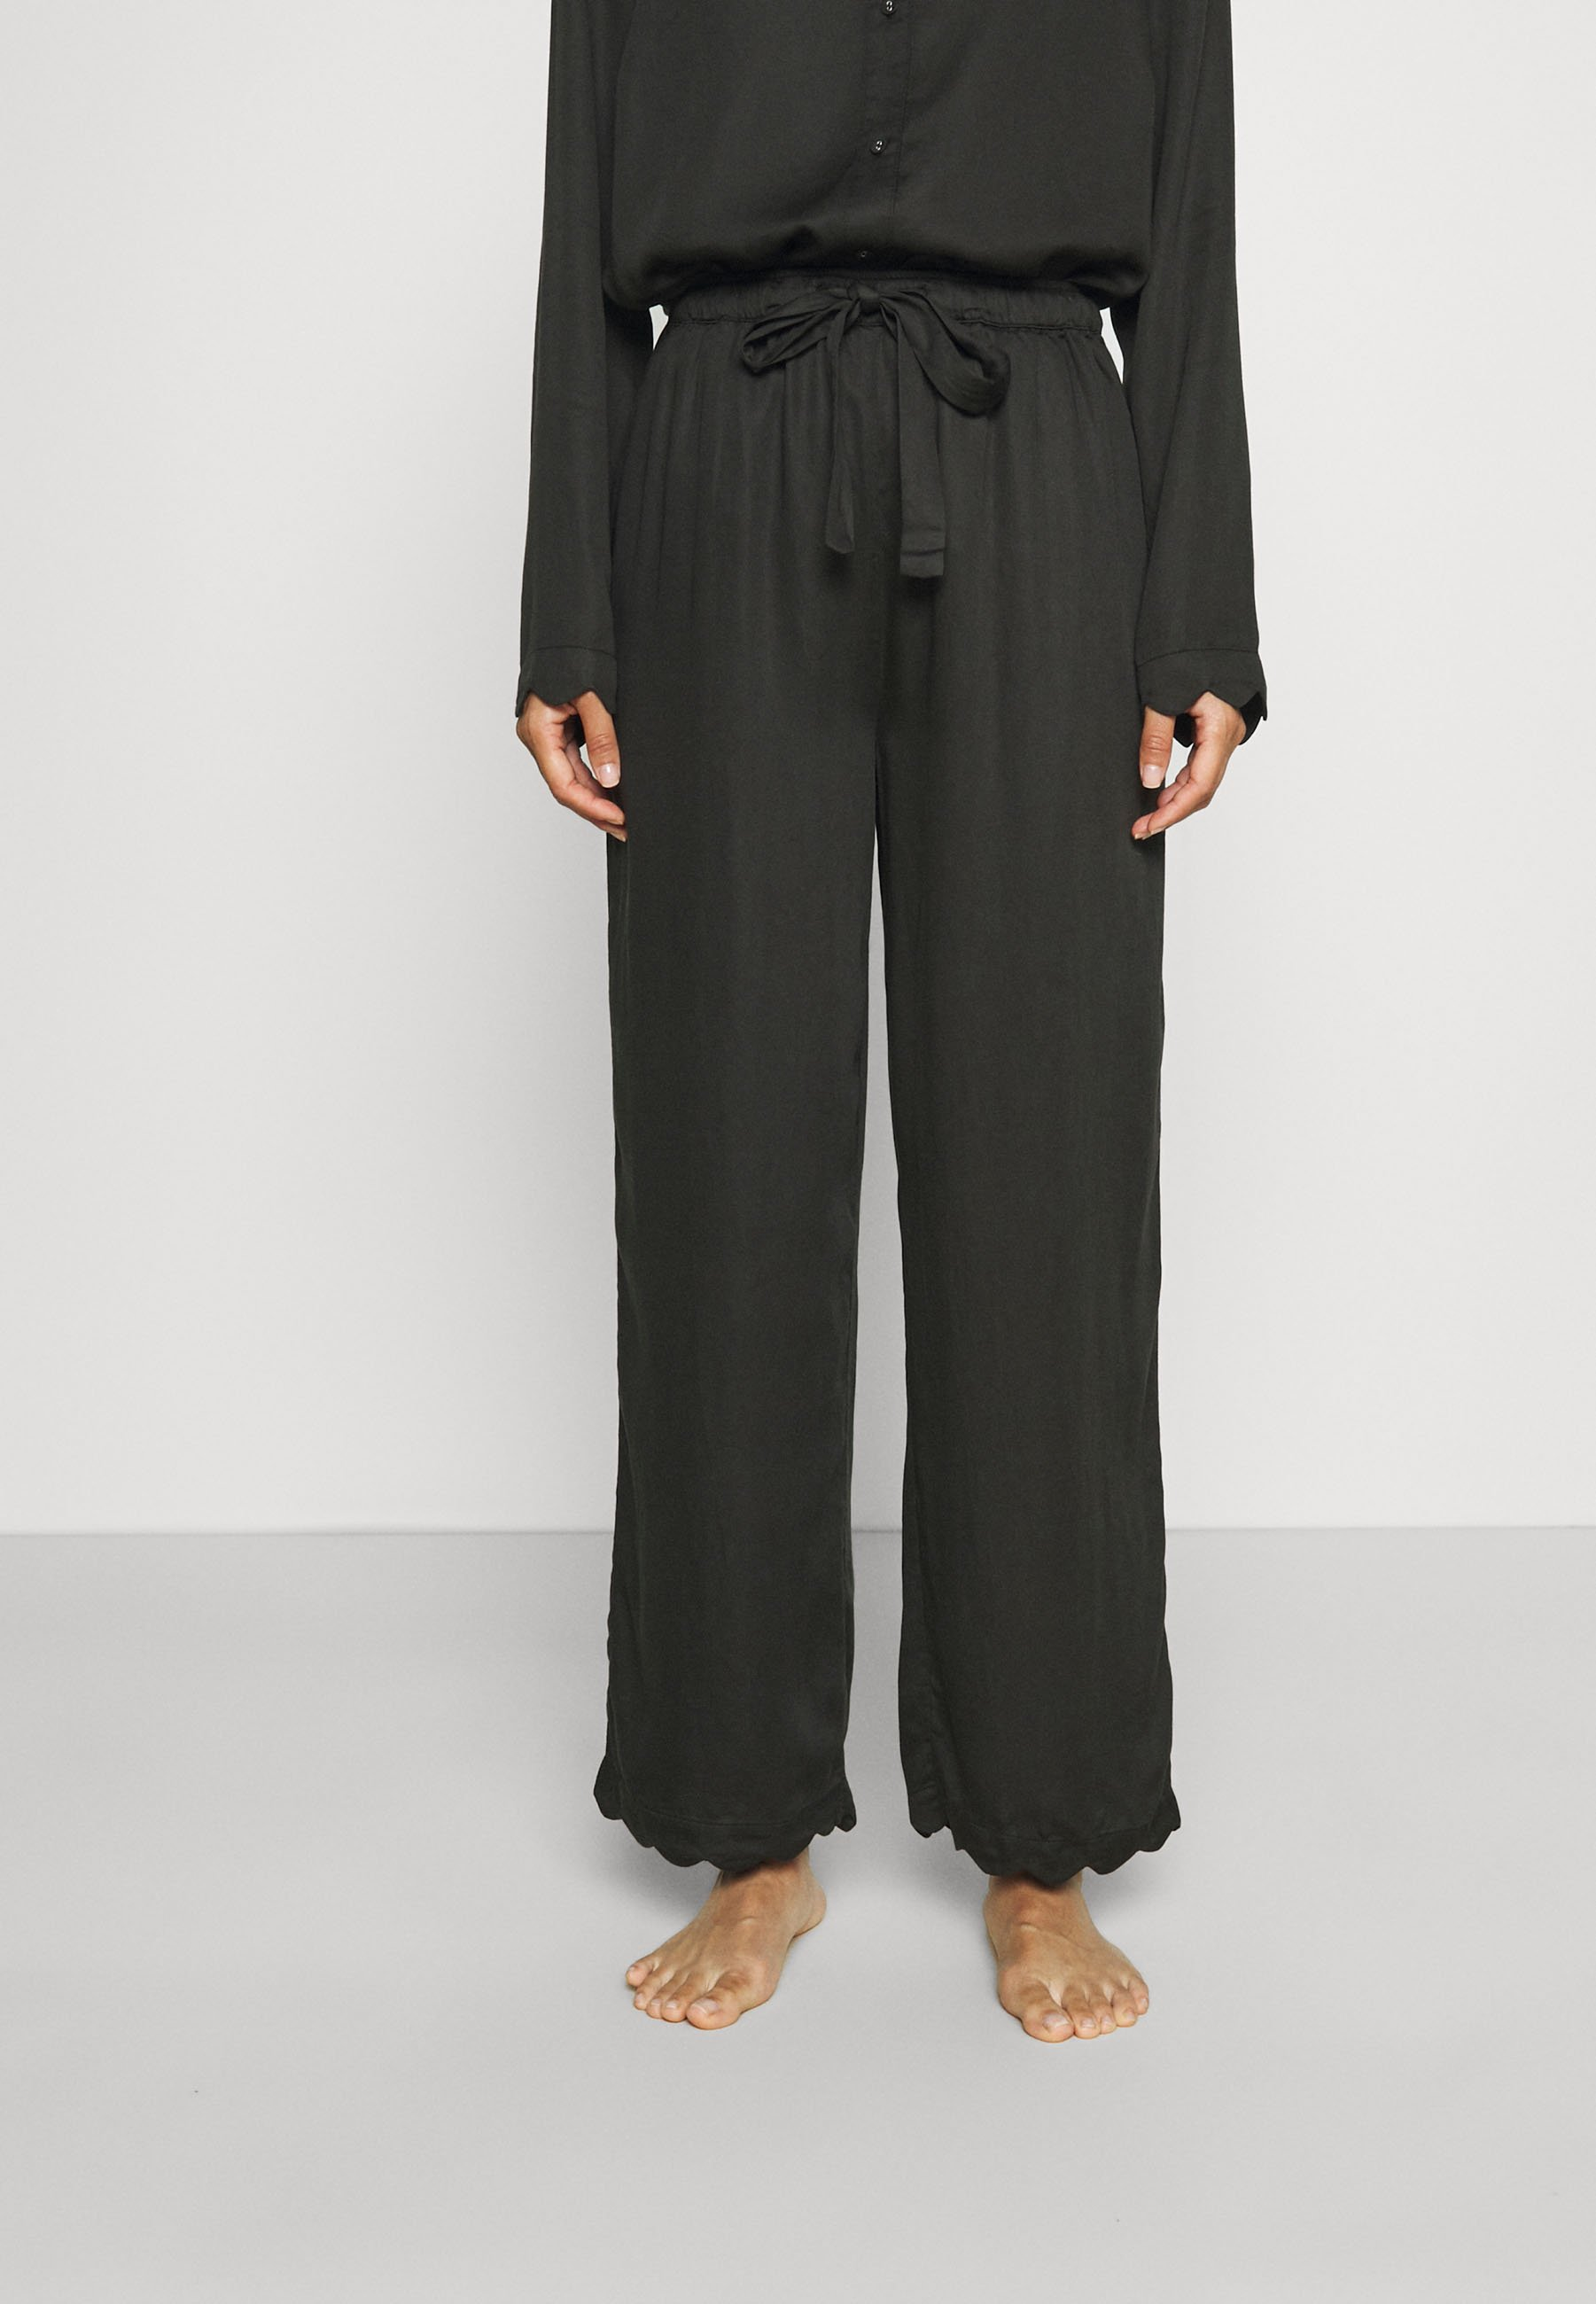 Damen JANE PANTS - Nachtwäsche Hose